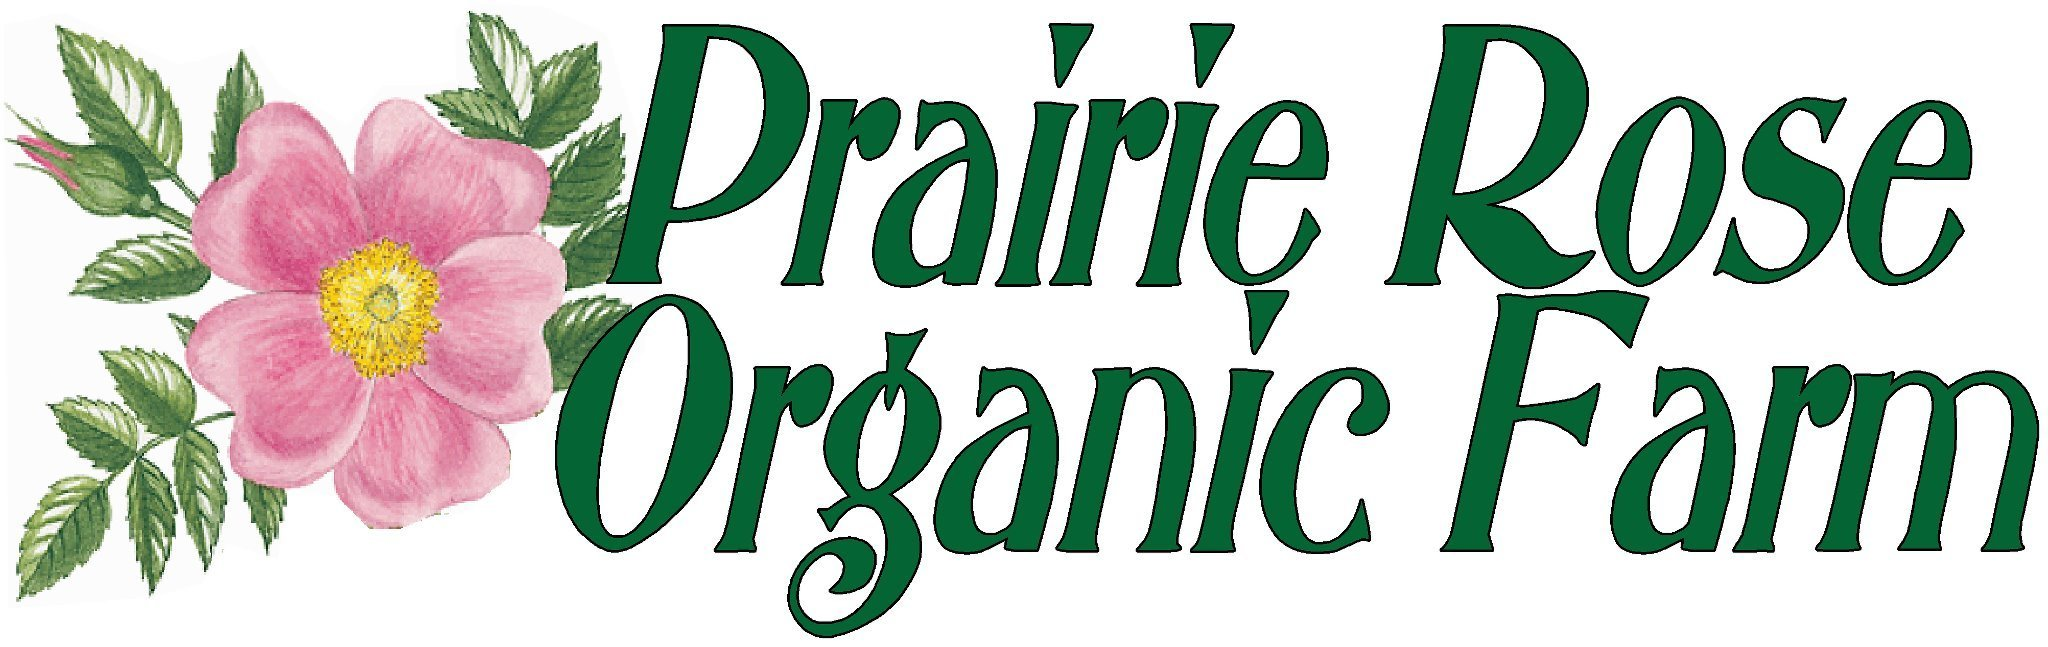 Prairie Rose Organic Bacon pro13